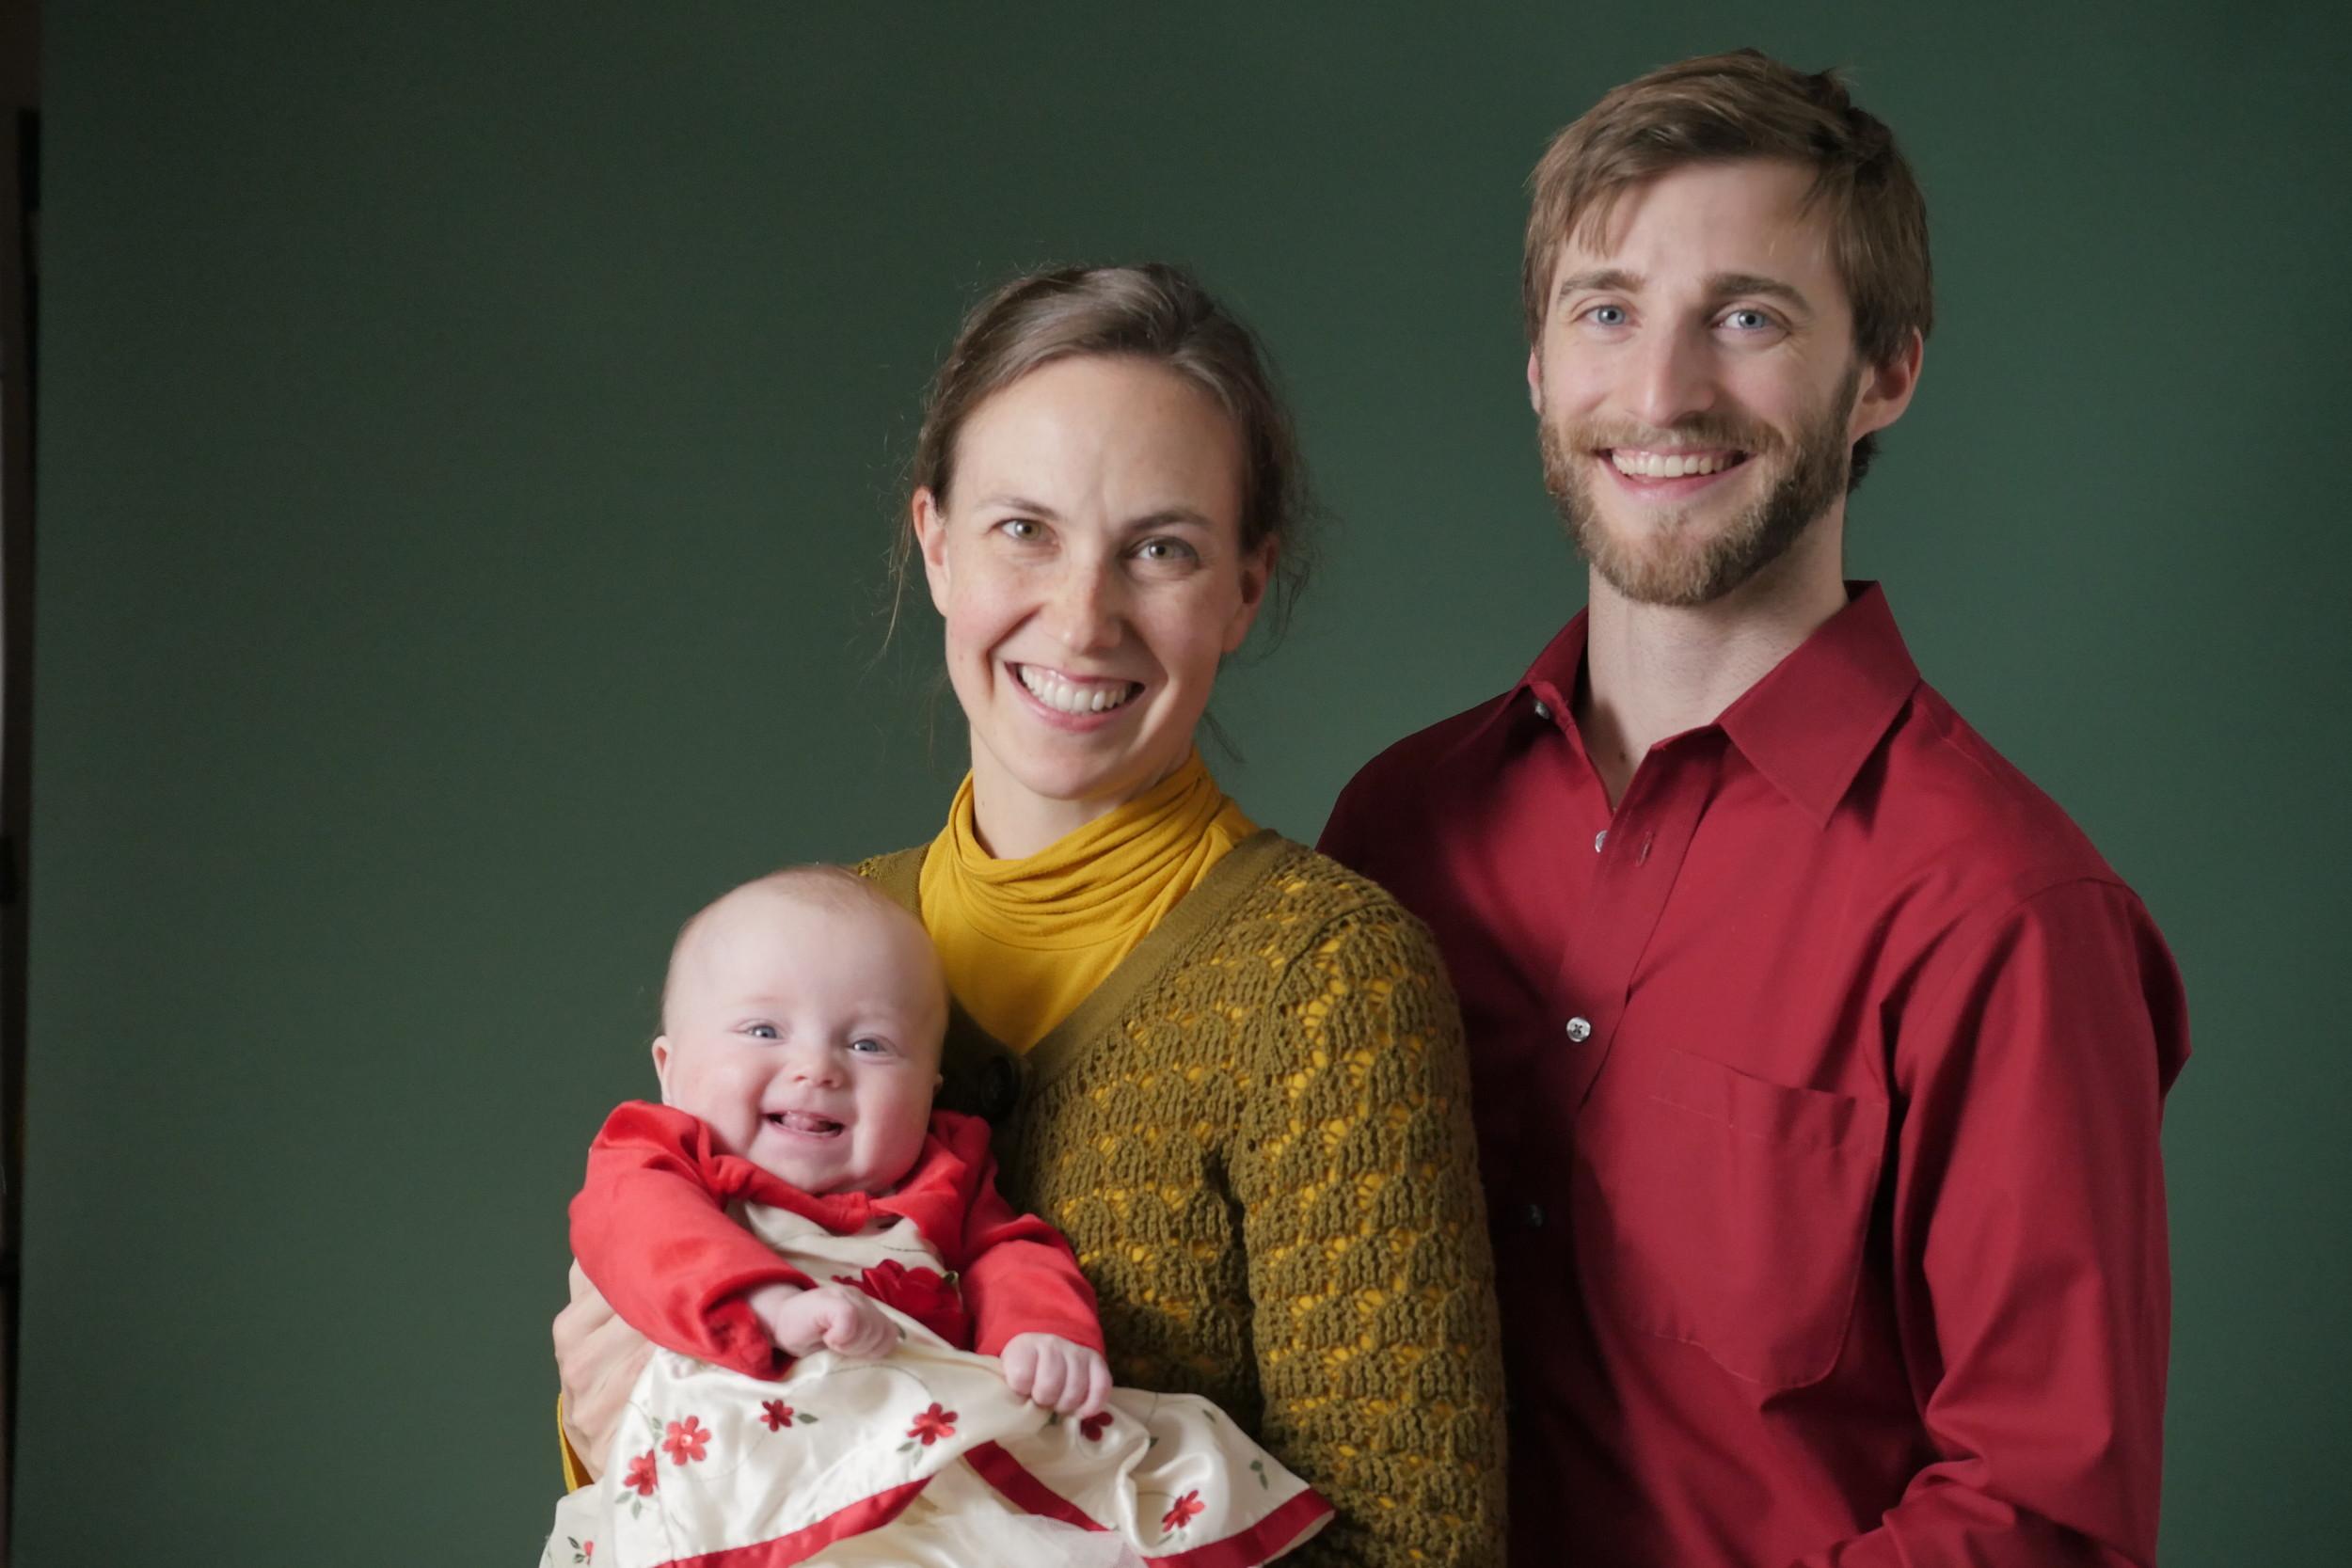 Shiloh, Diana, and Matthew Burns